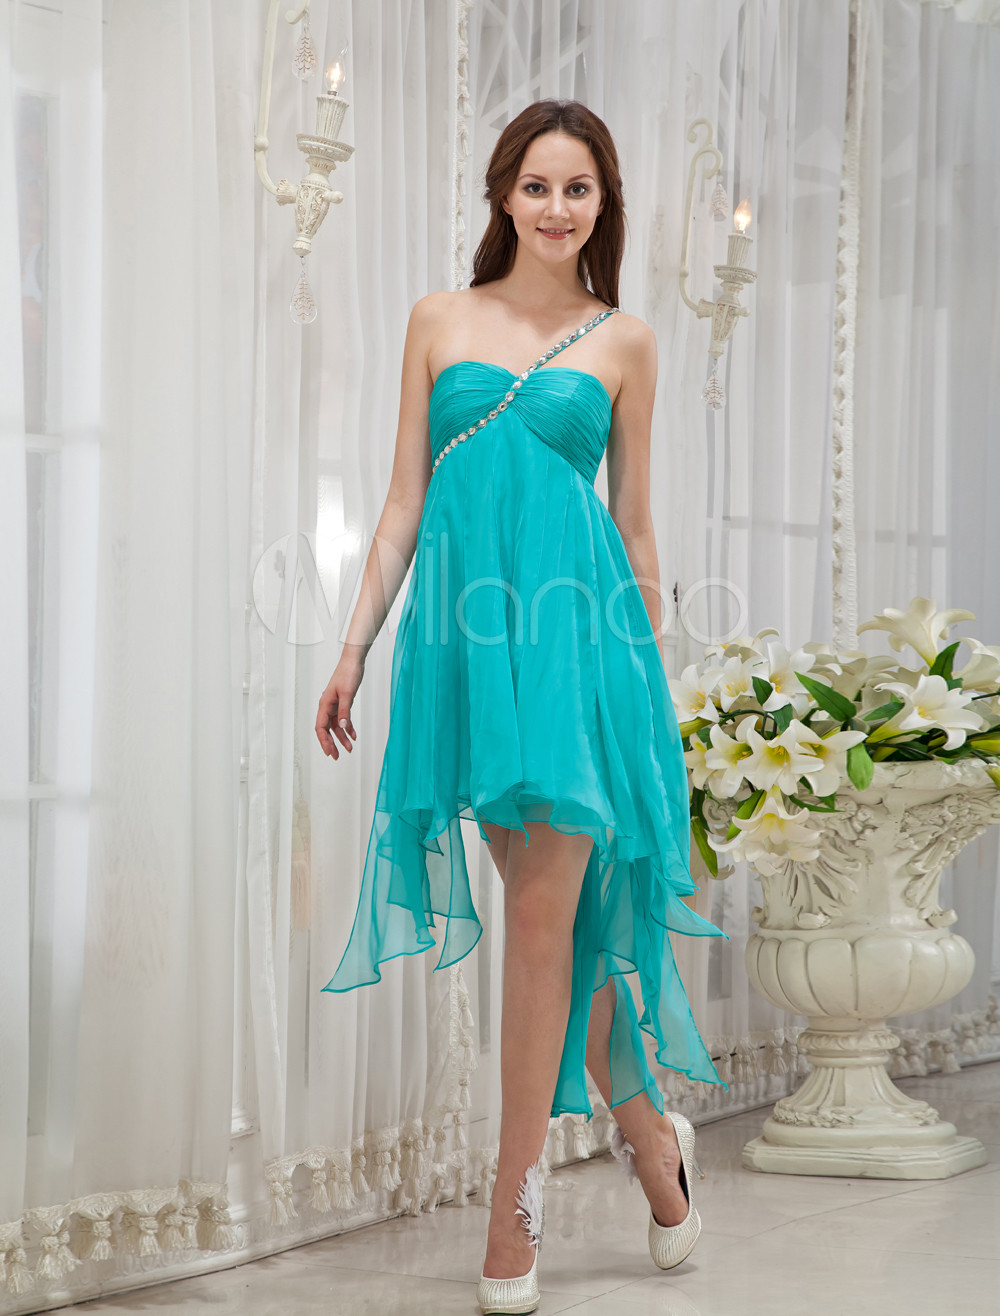 Green One-Shoulder Rhinestone Silk Prom Dress (Wedding Prom Dresses) photo